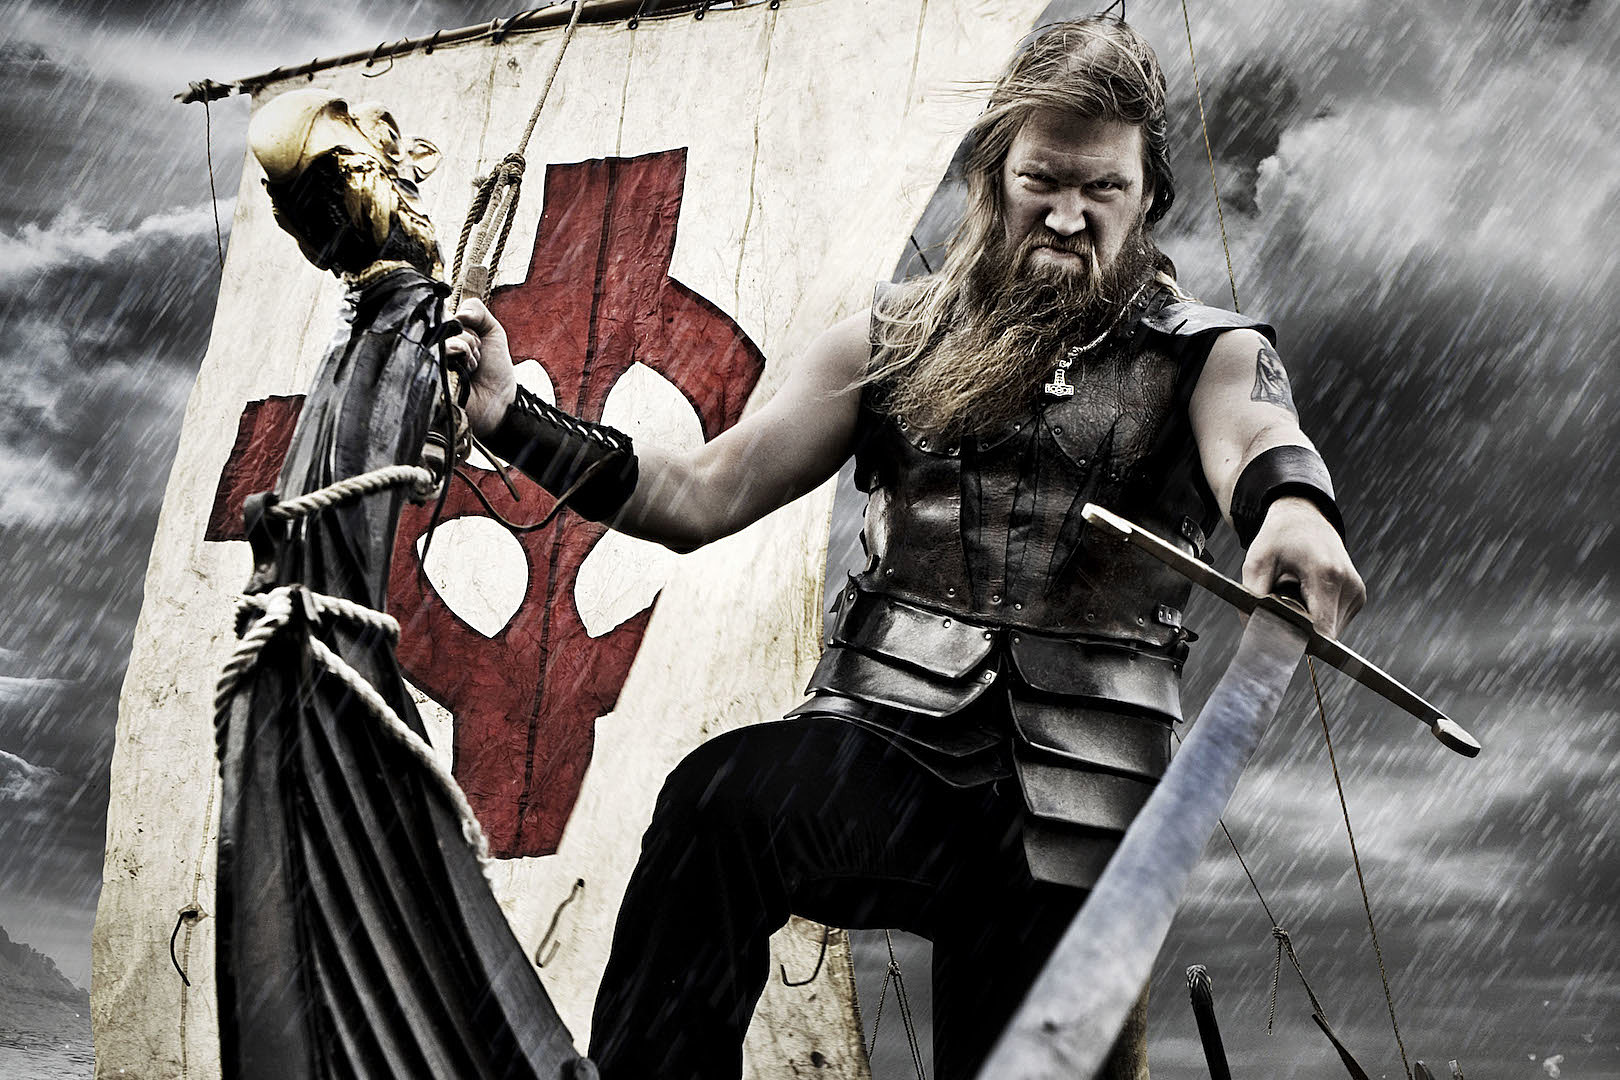 Amon Amarth's Johan Hegg: Why I Love MMA Training